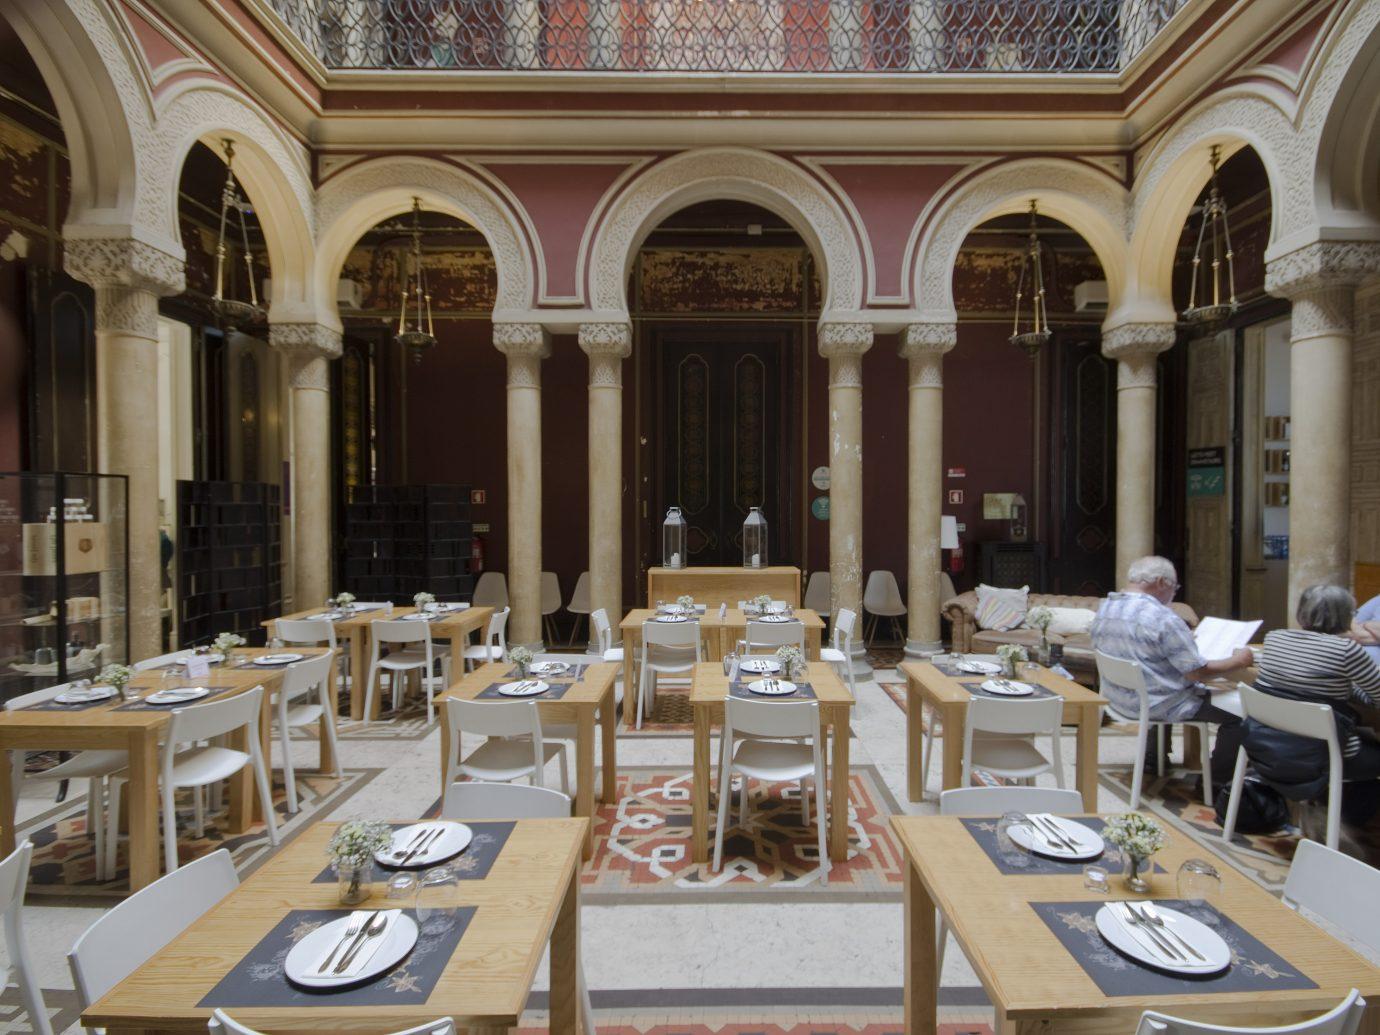 Dining interior in Embaixada's courtyard